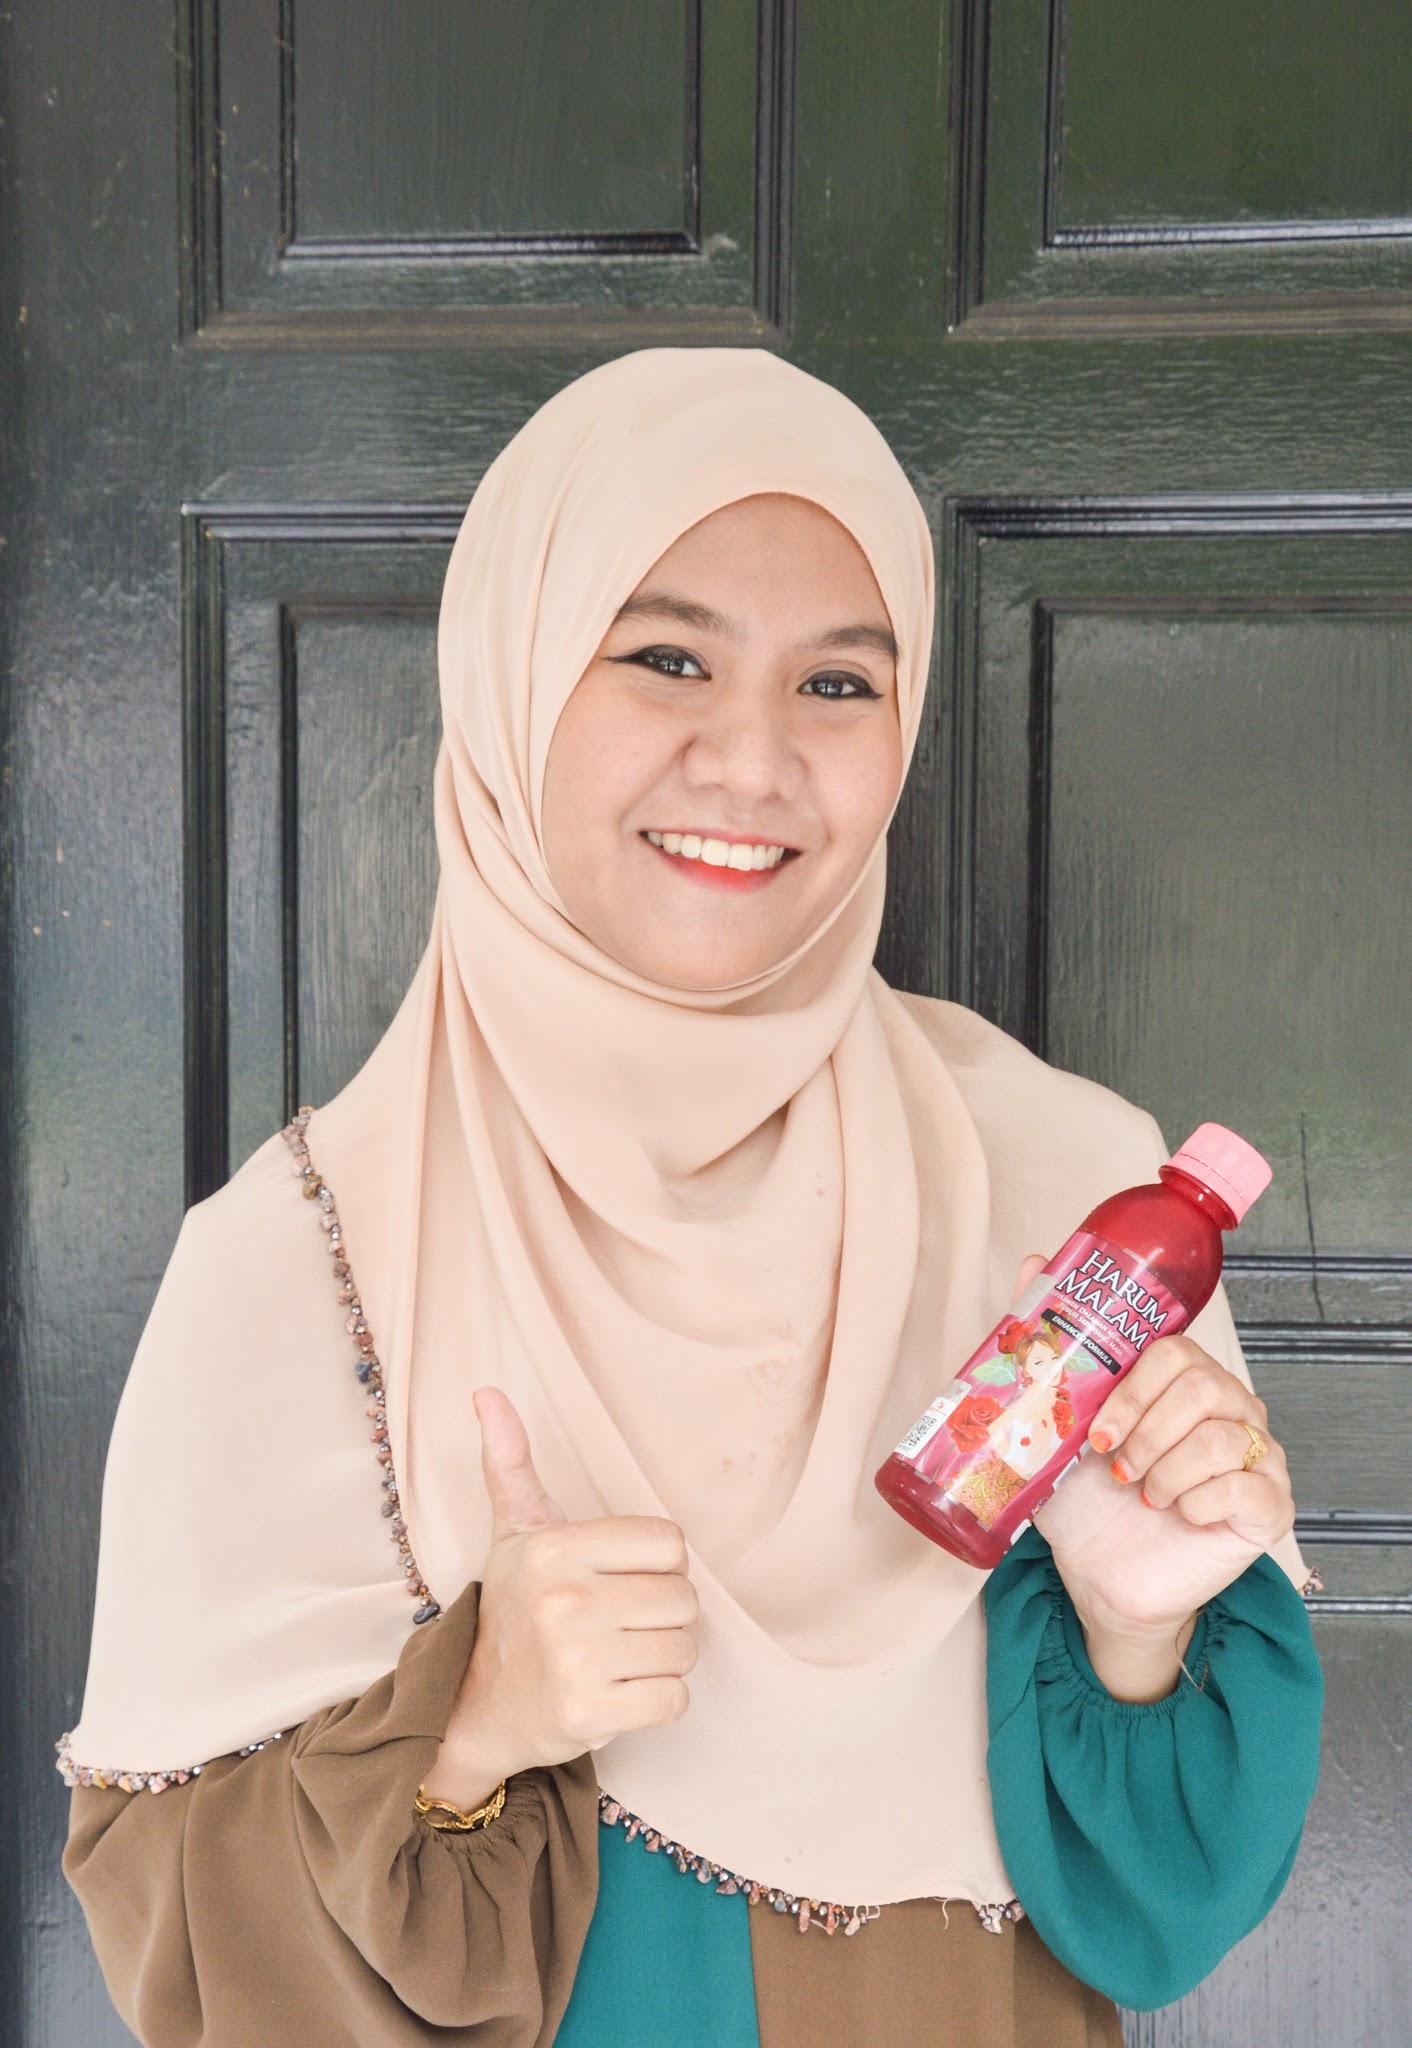 Millennial Gen Sdn Bhd , Harum Malam healthy drink, woman healhty drink, kebaikan harum malam, kandungan harum malam,